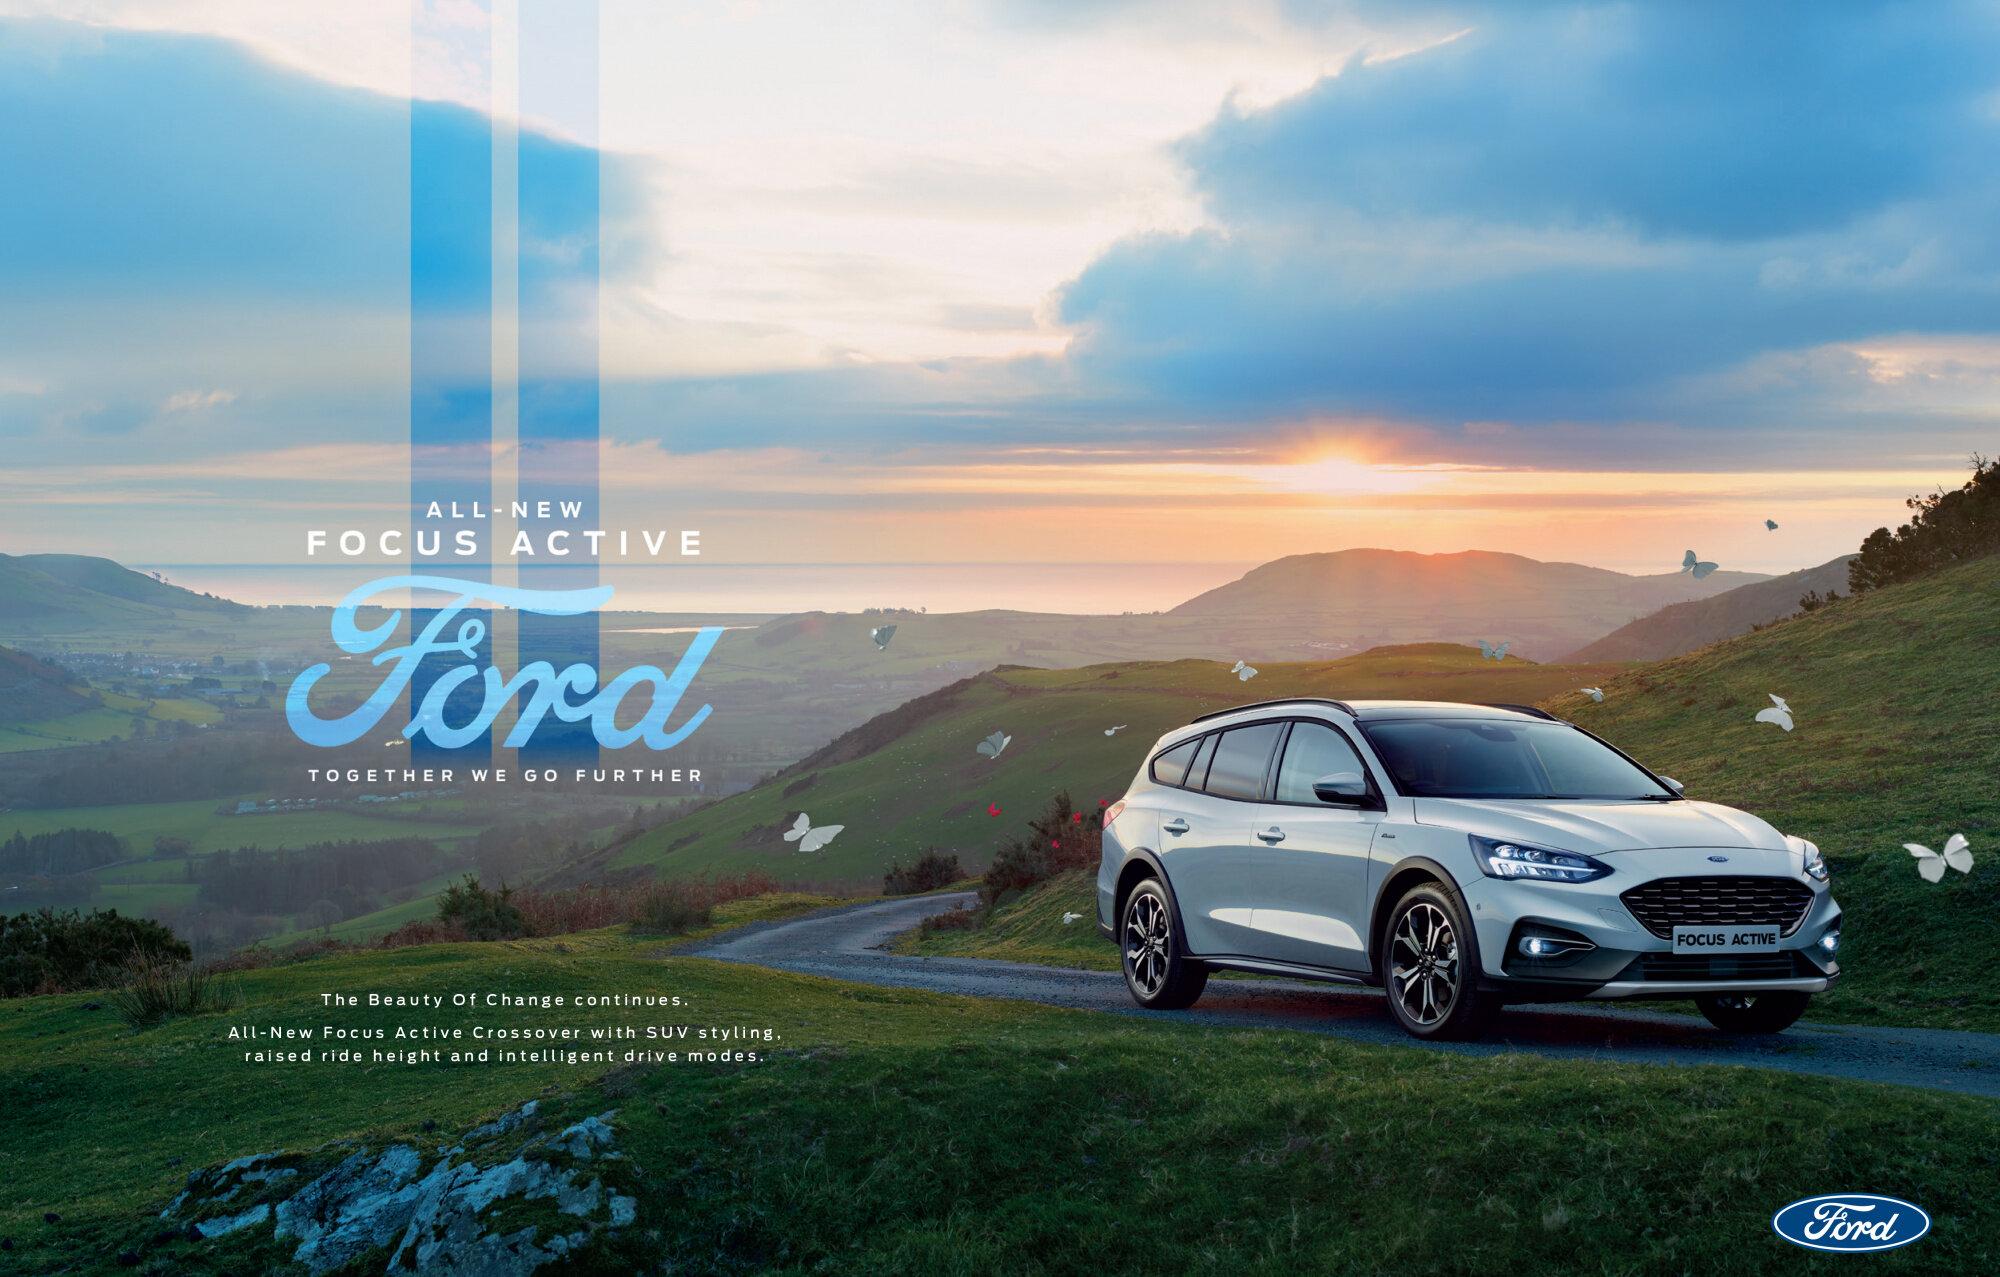 ford-focus-1-2000x1277.jpg